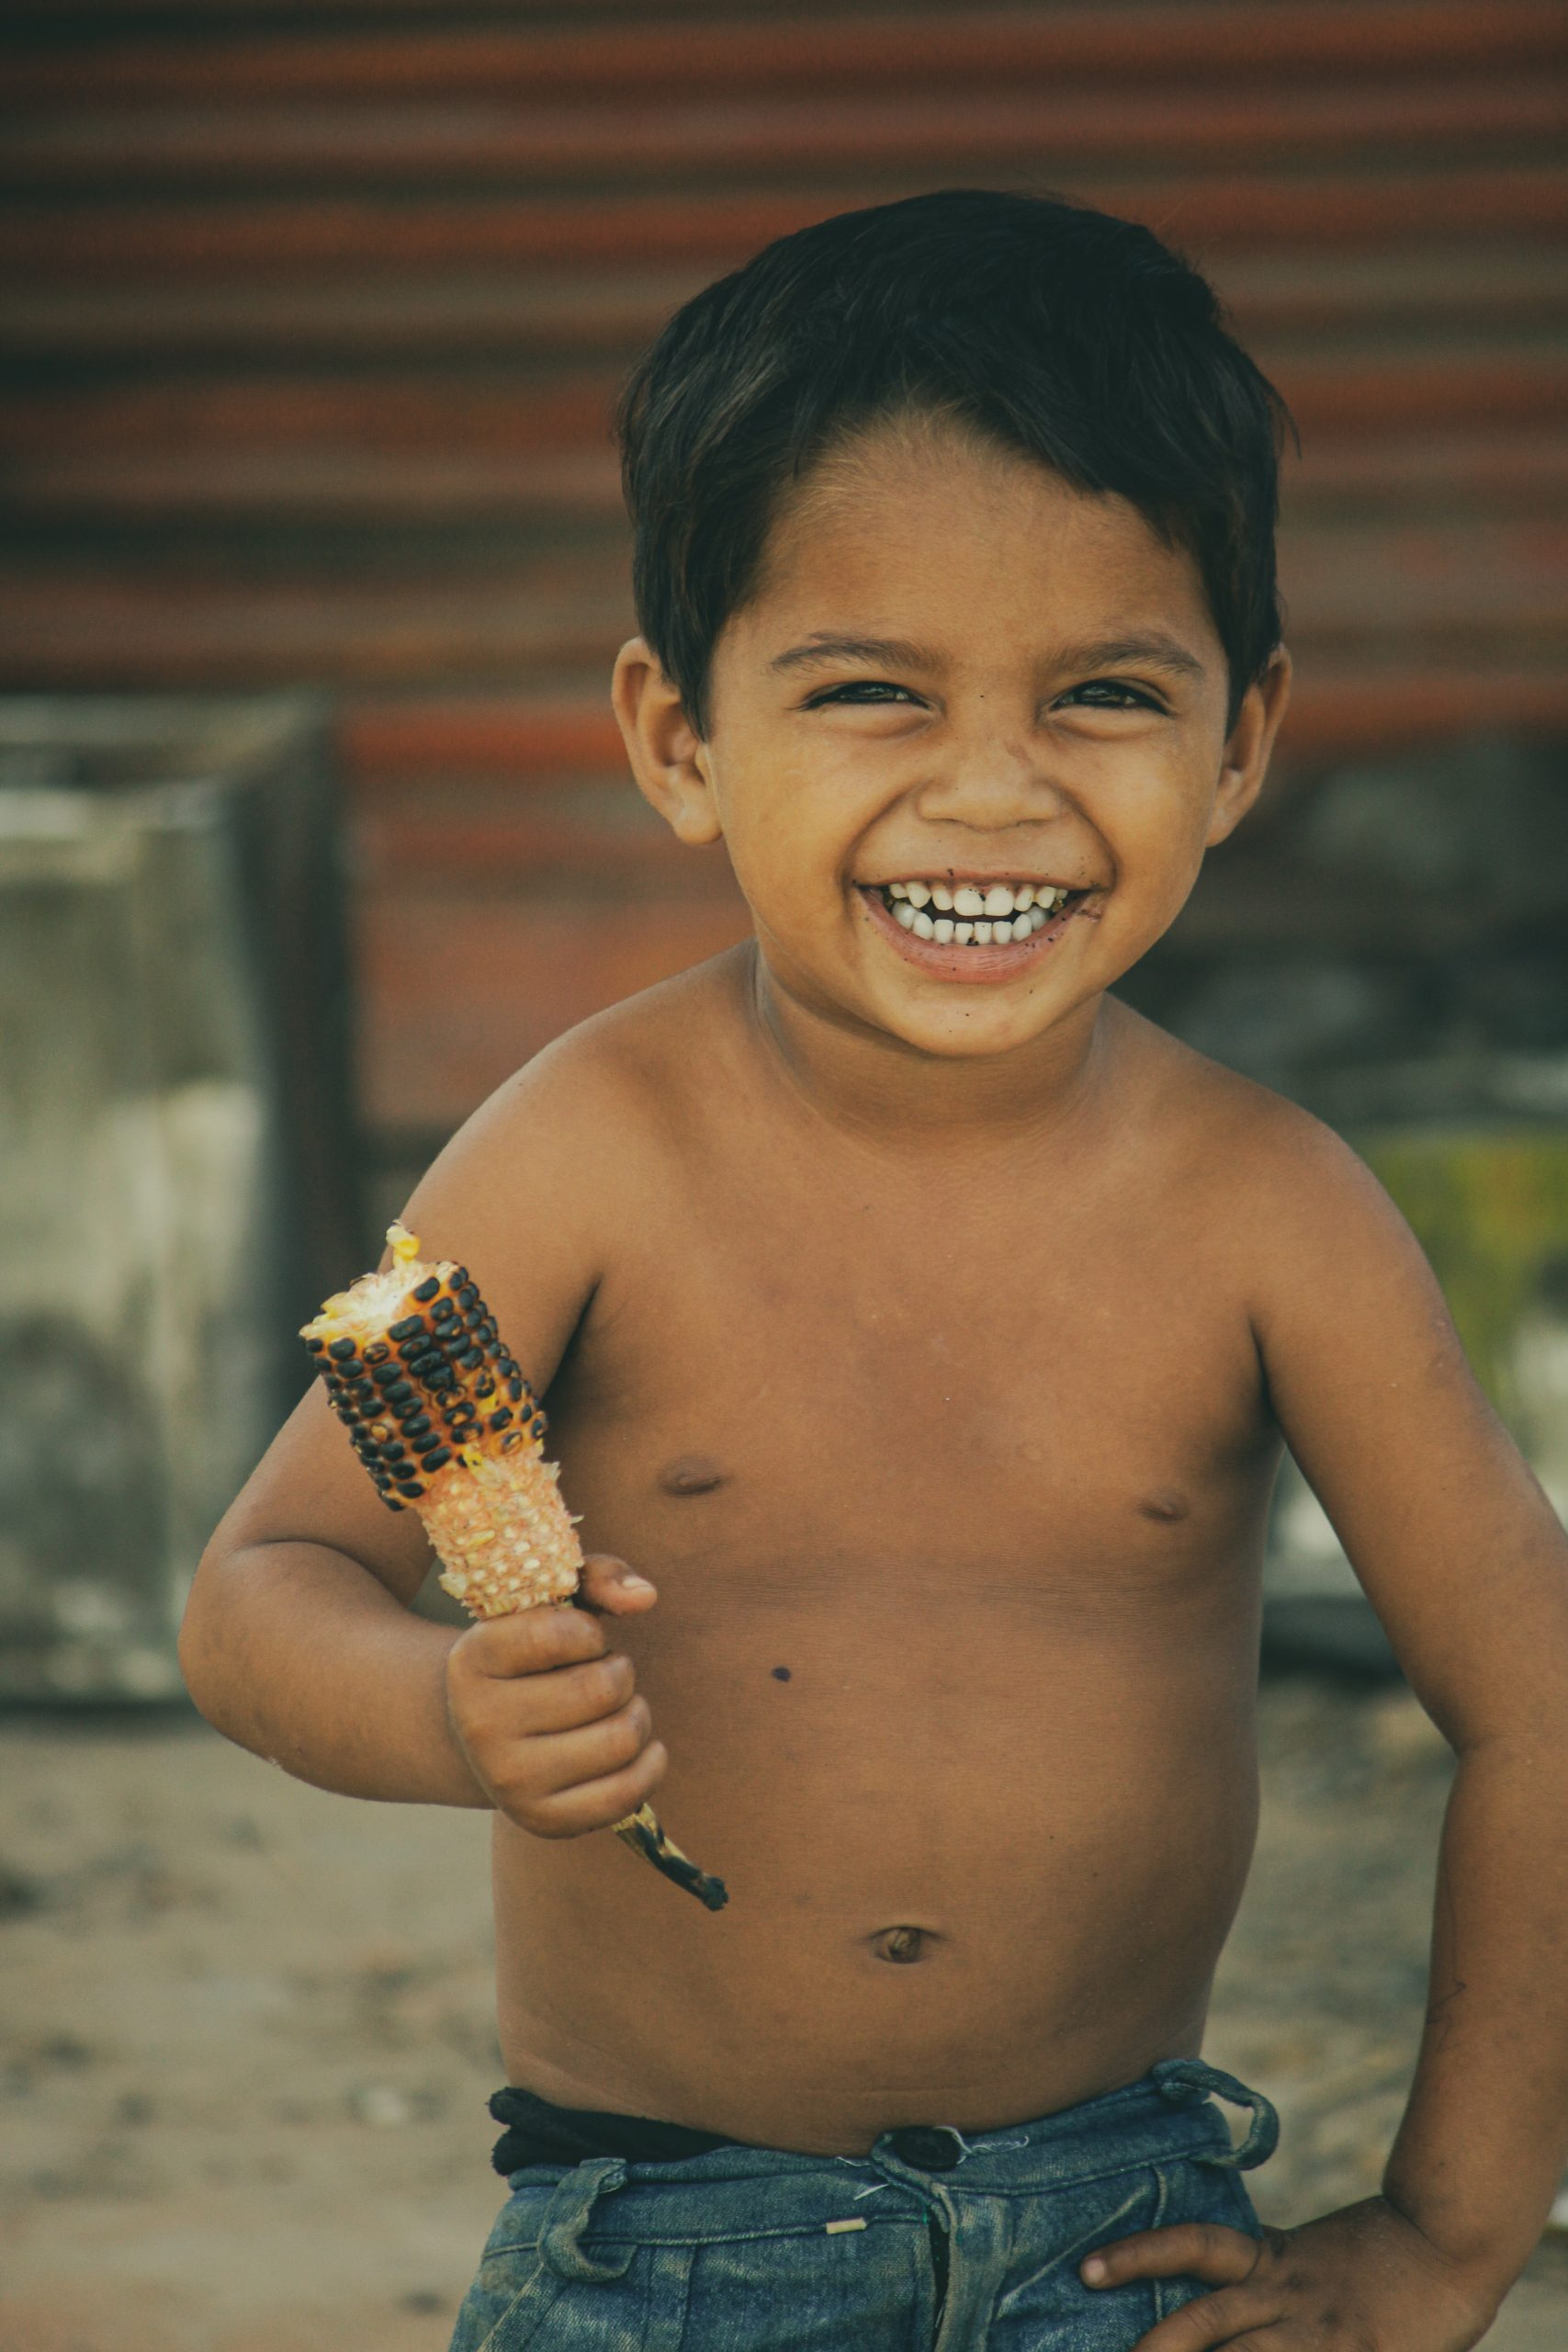 Kid eating corn cob